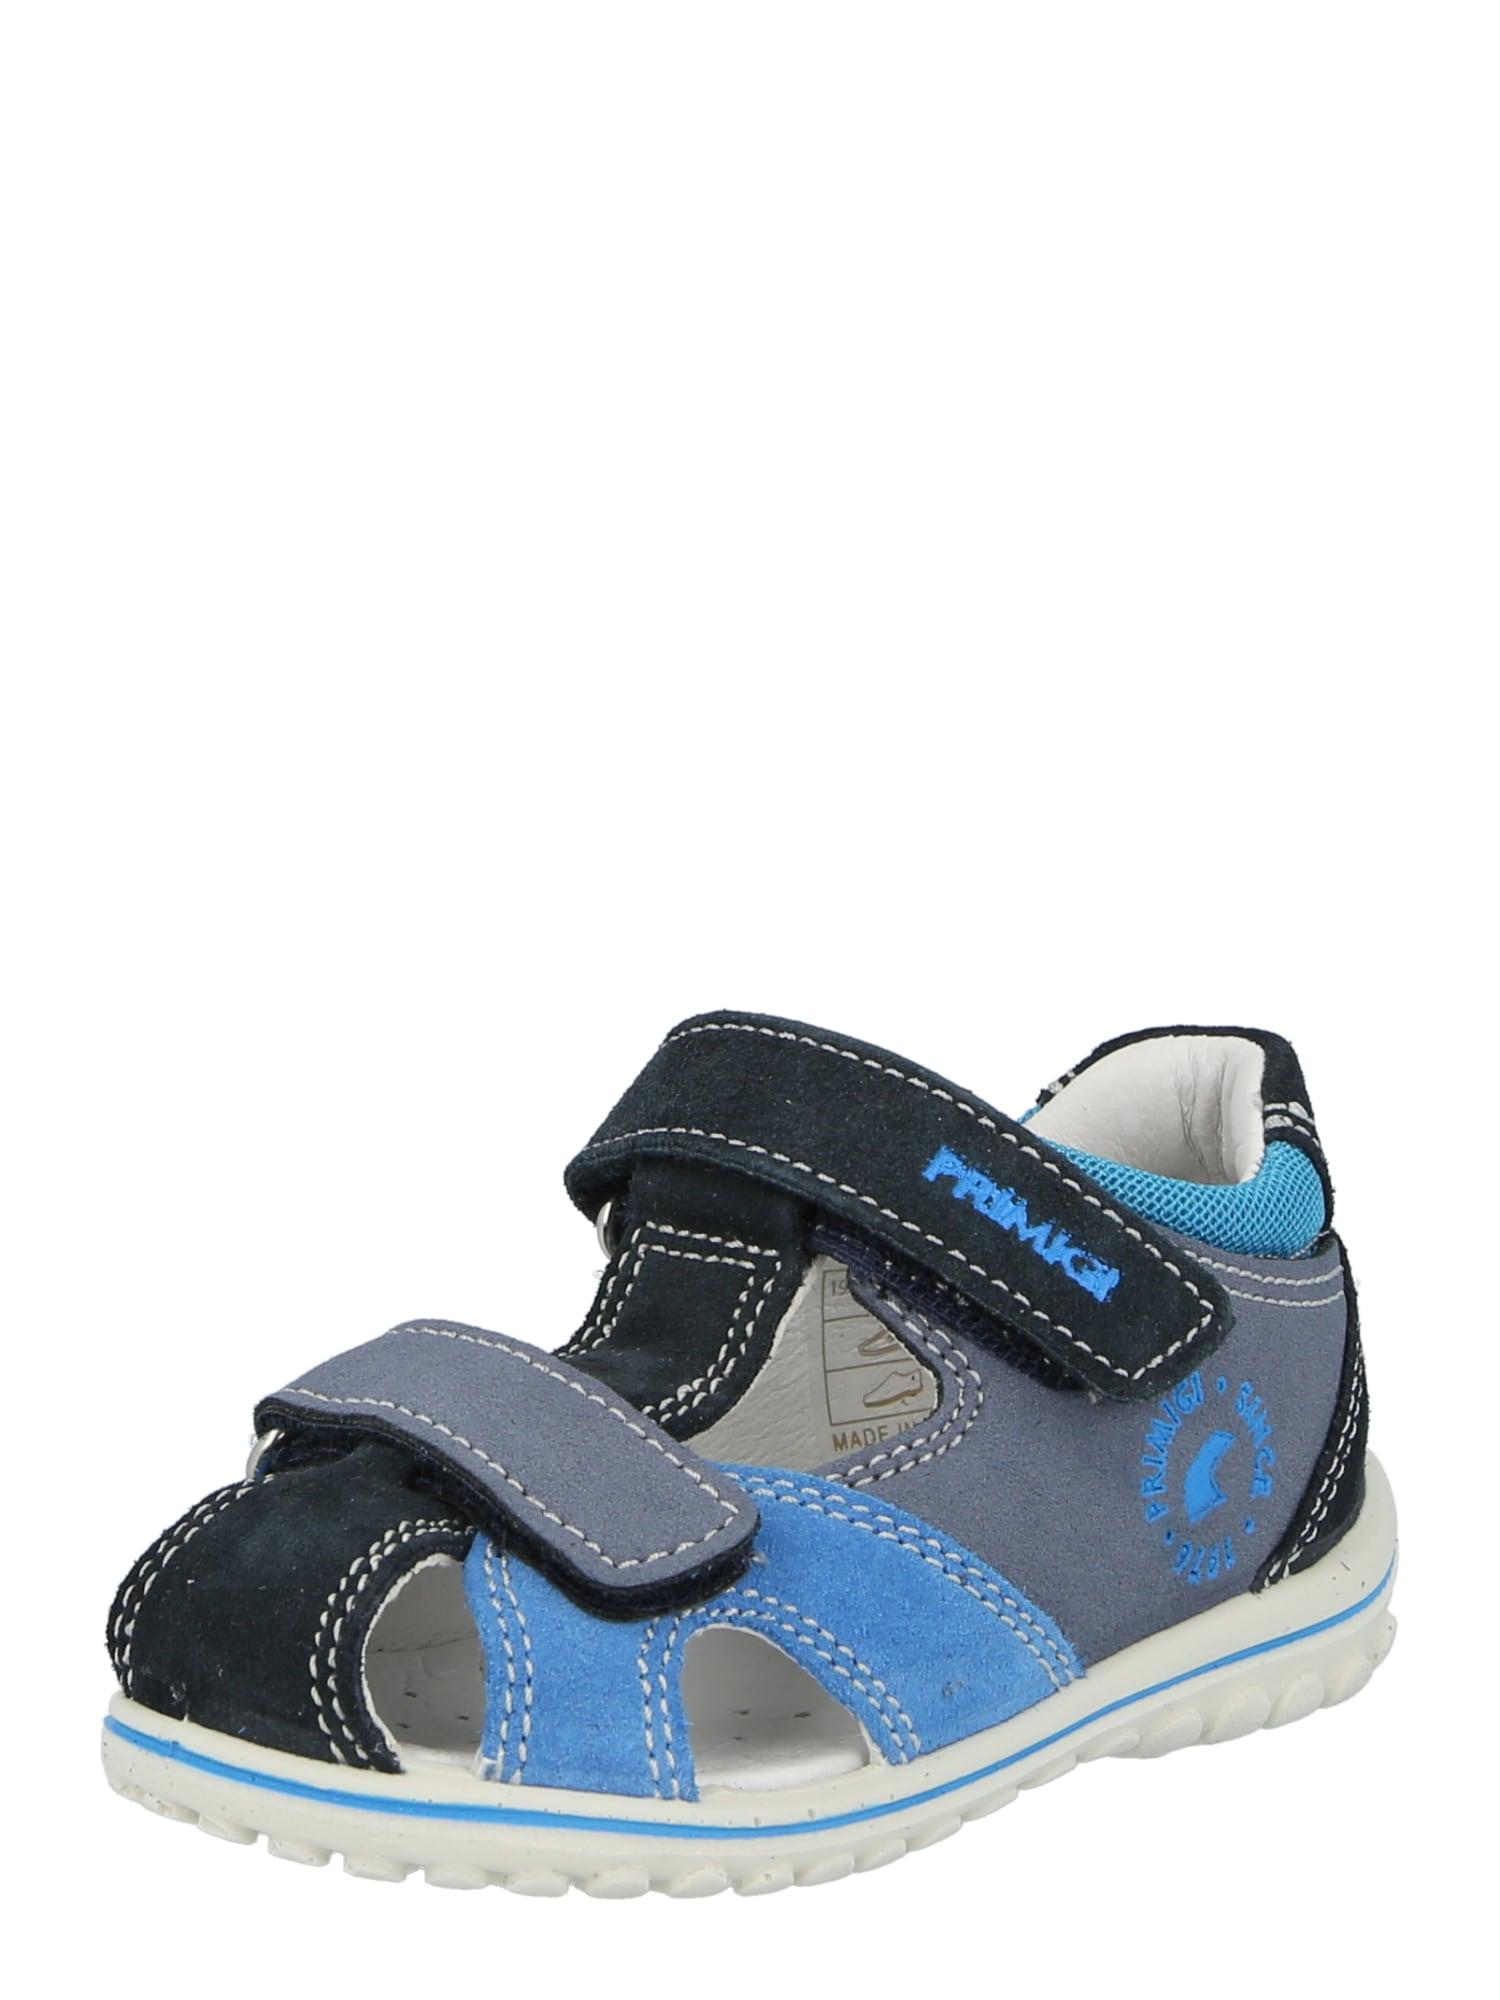 PRIMIGI Atviri batai mėlyna dūmų spalva / nakties mėlyna / dūmų pilka